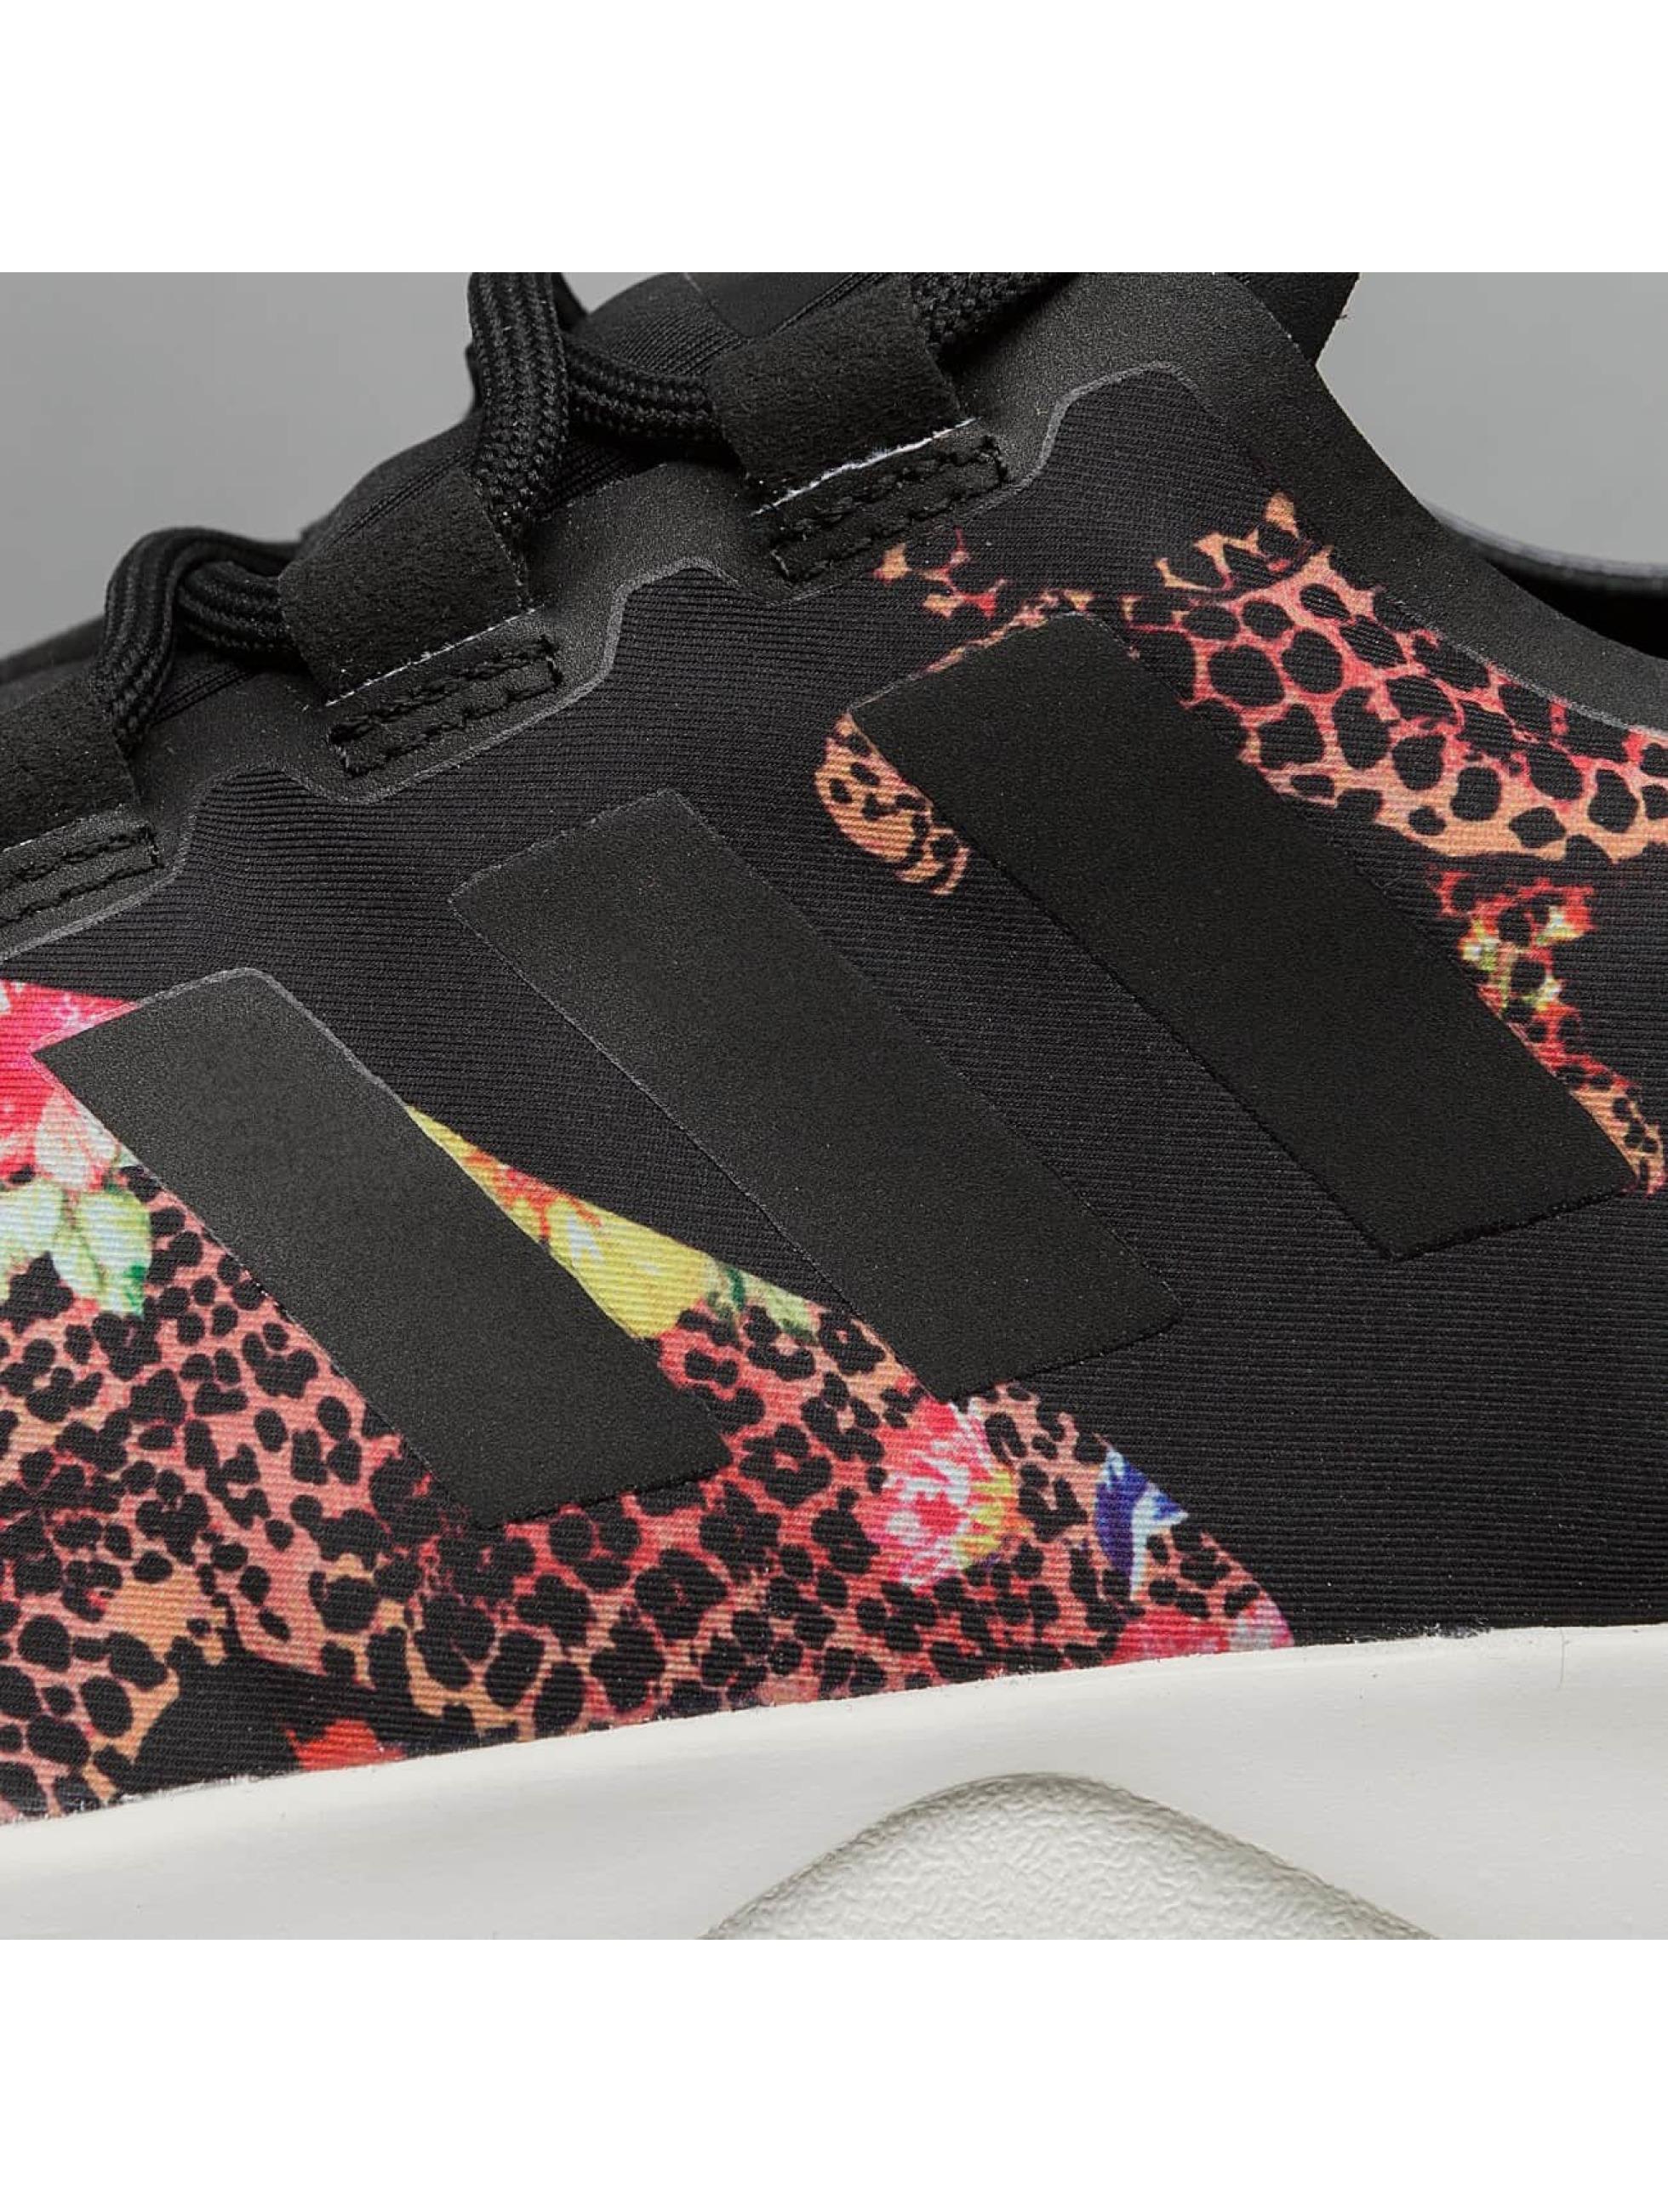 adidas originals Sneakers ZX Flux ADV Verve black